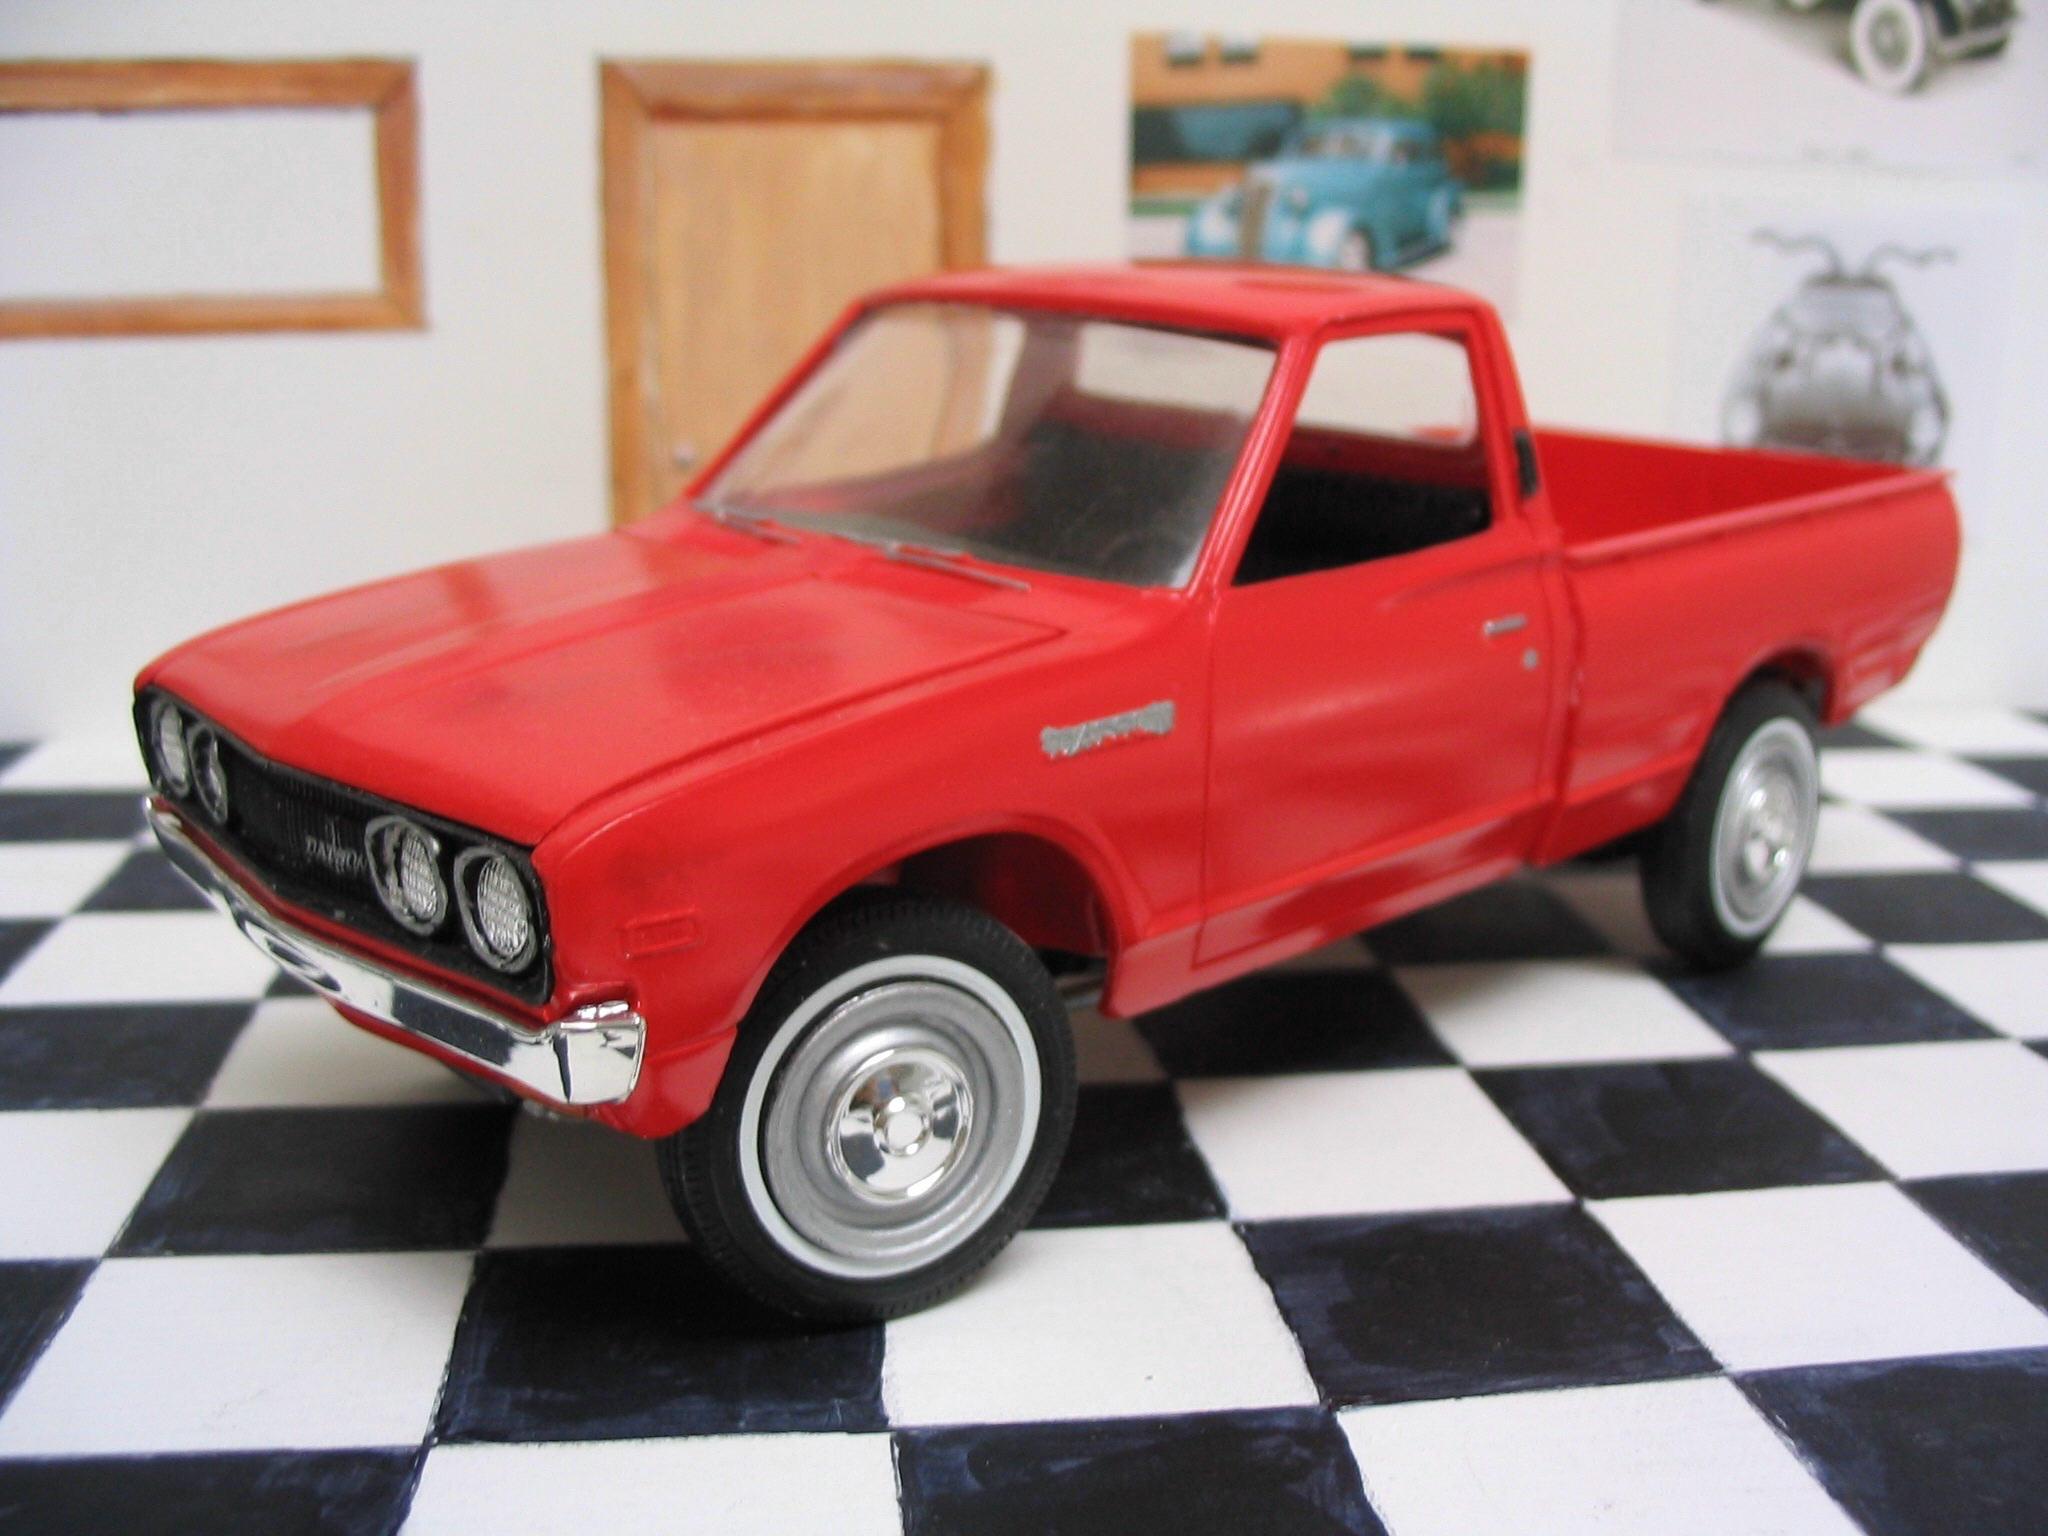 Mpc 1975 Datsun Pickup Page 2 Truck Kit News Amp Reviews